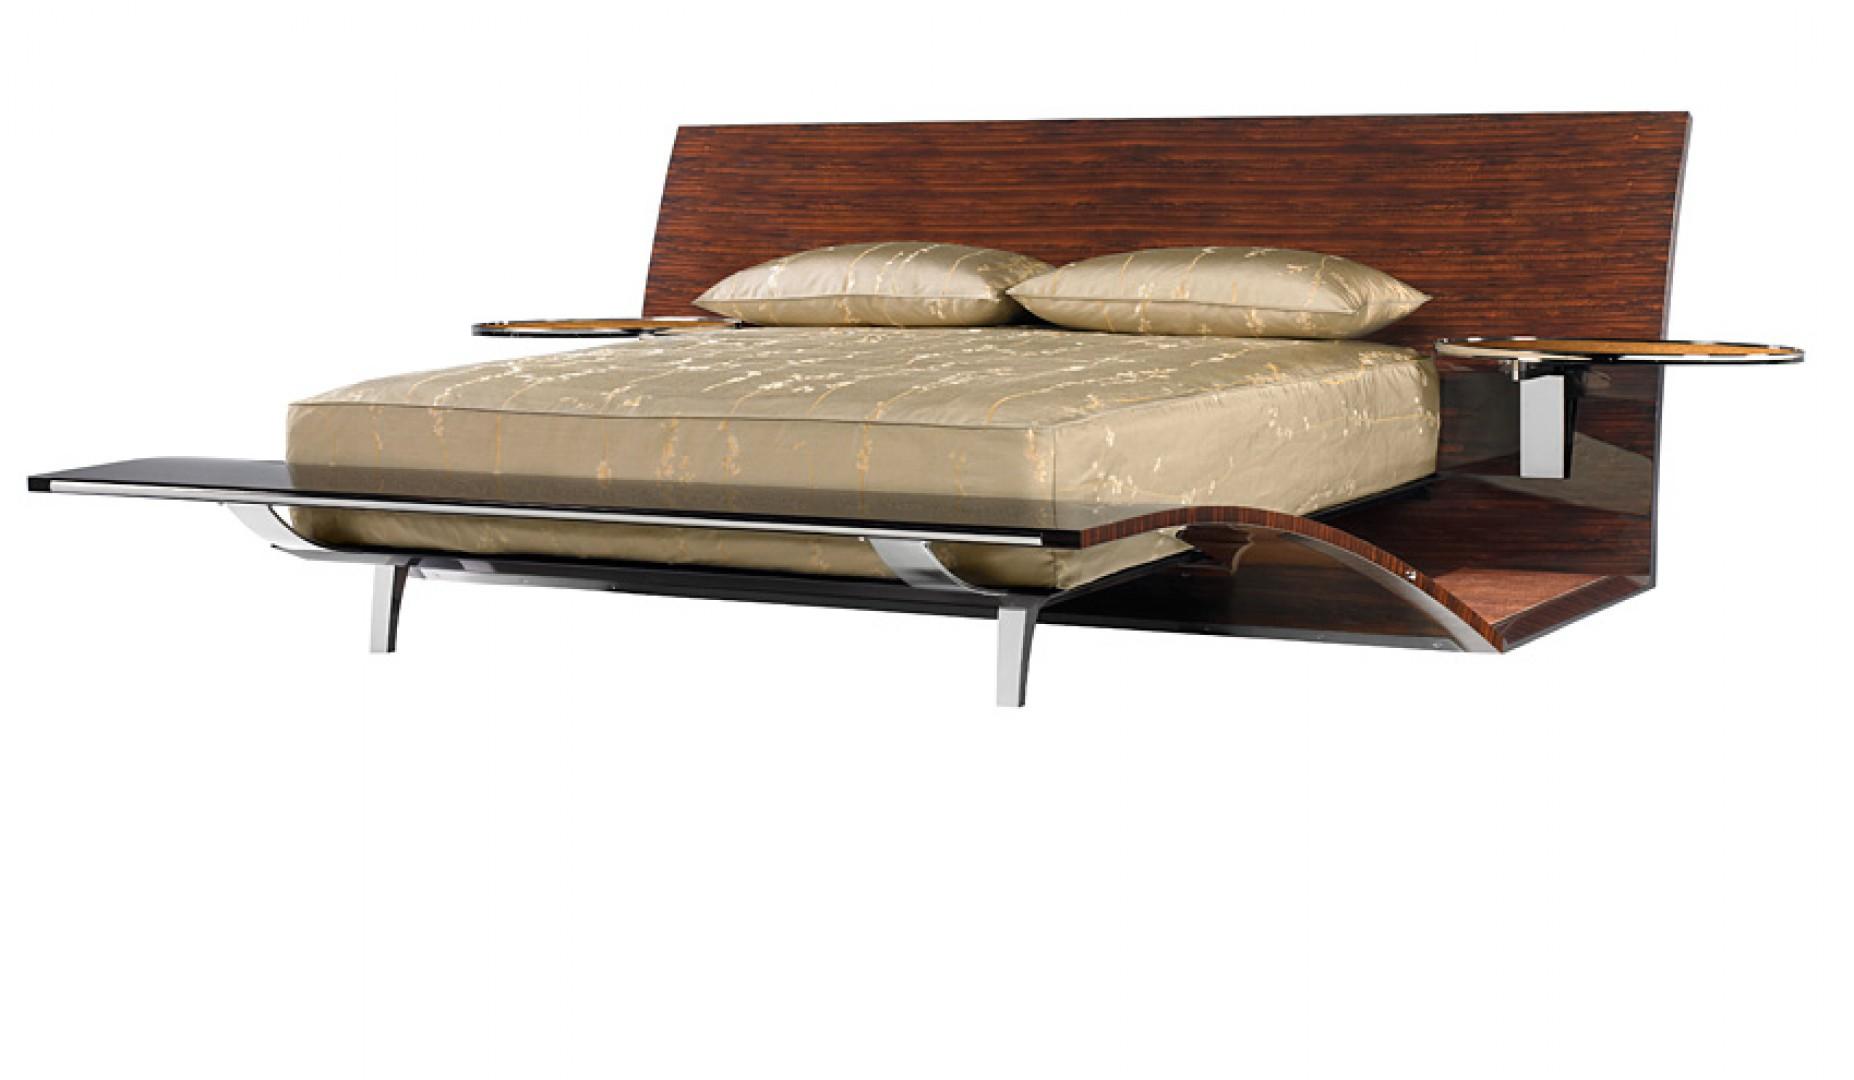 Łóżko PP-2 marki Pitt-Pollaro. Projekt: Brad Pitt. Fot. Pitt-Pollaro